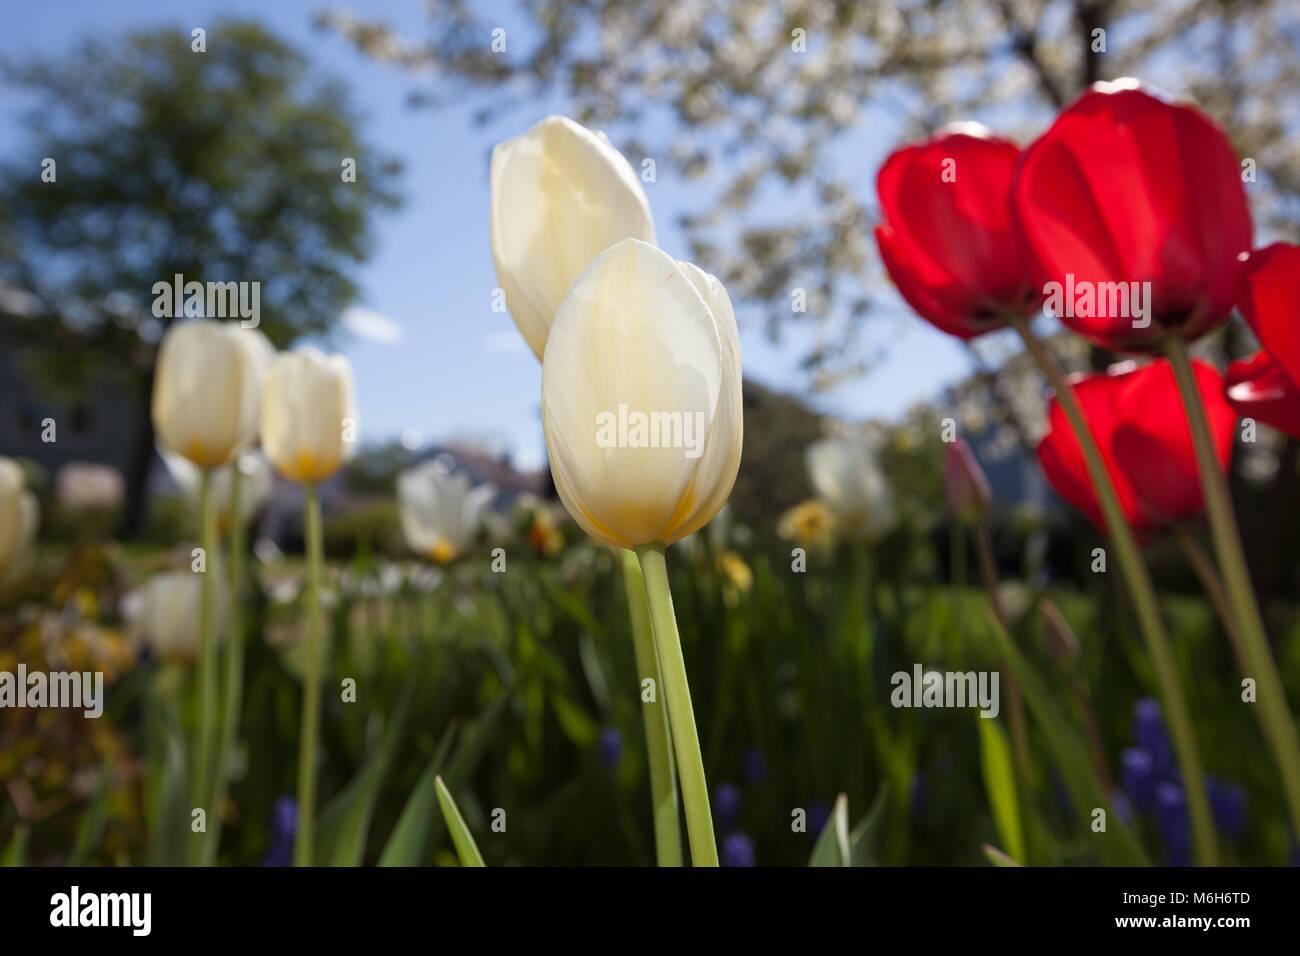 'Purissima, White Emperor' Fosteriana Tulip, Kejsartulpan (Tulipa fosteriana-hybrid ) - Stock Image